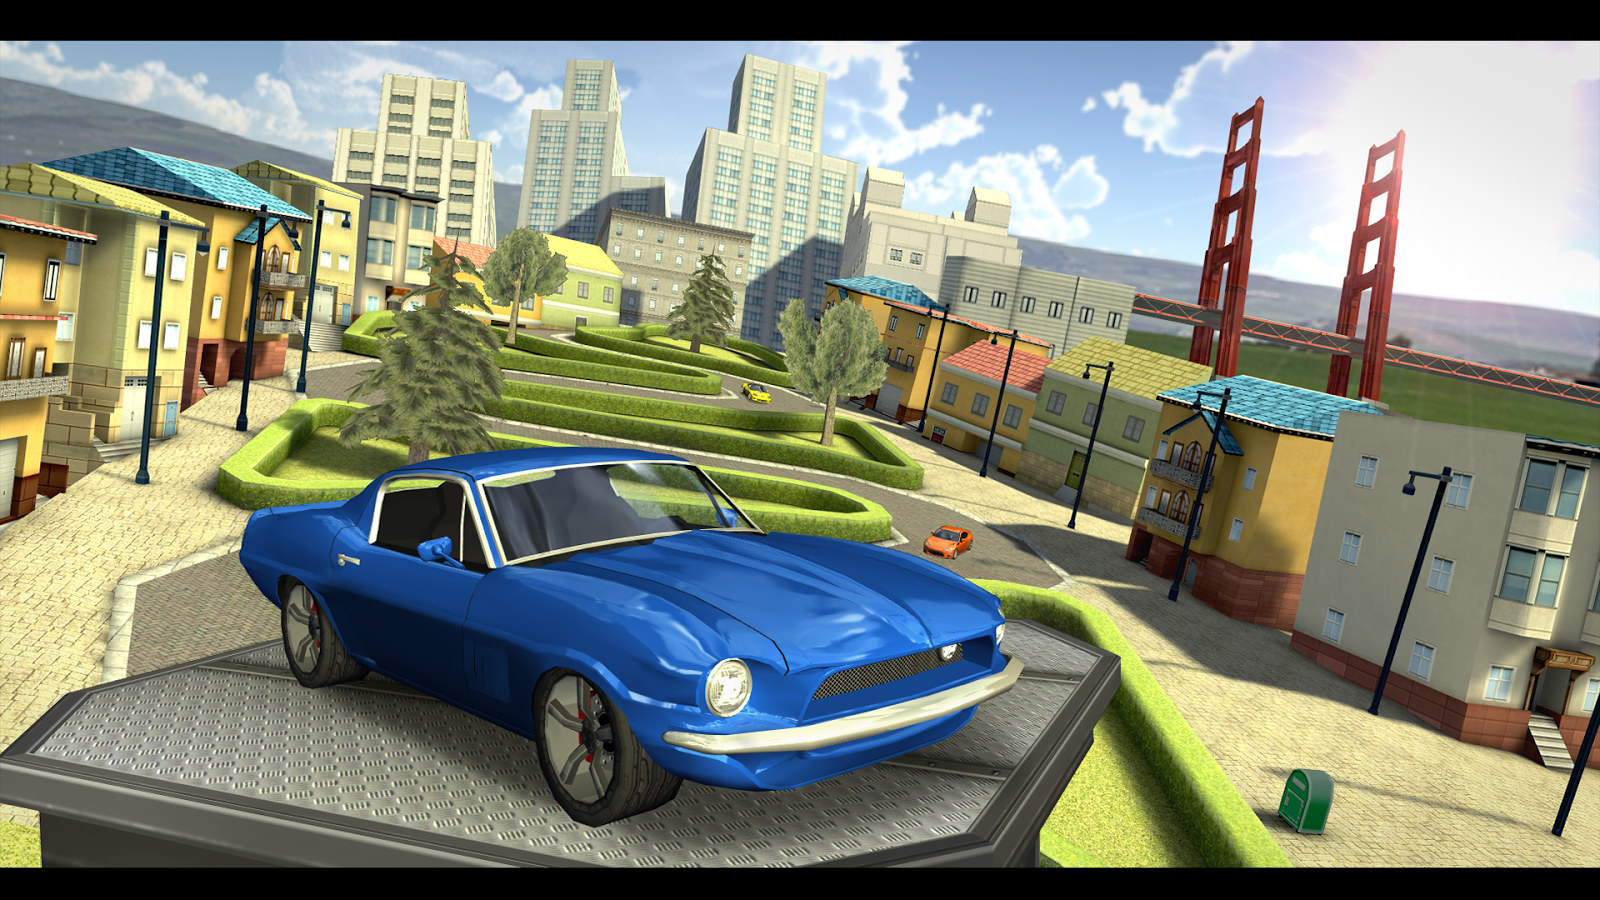 driving-simulator-game-for-android-car-driving-simulator